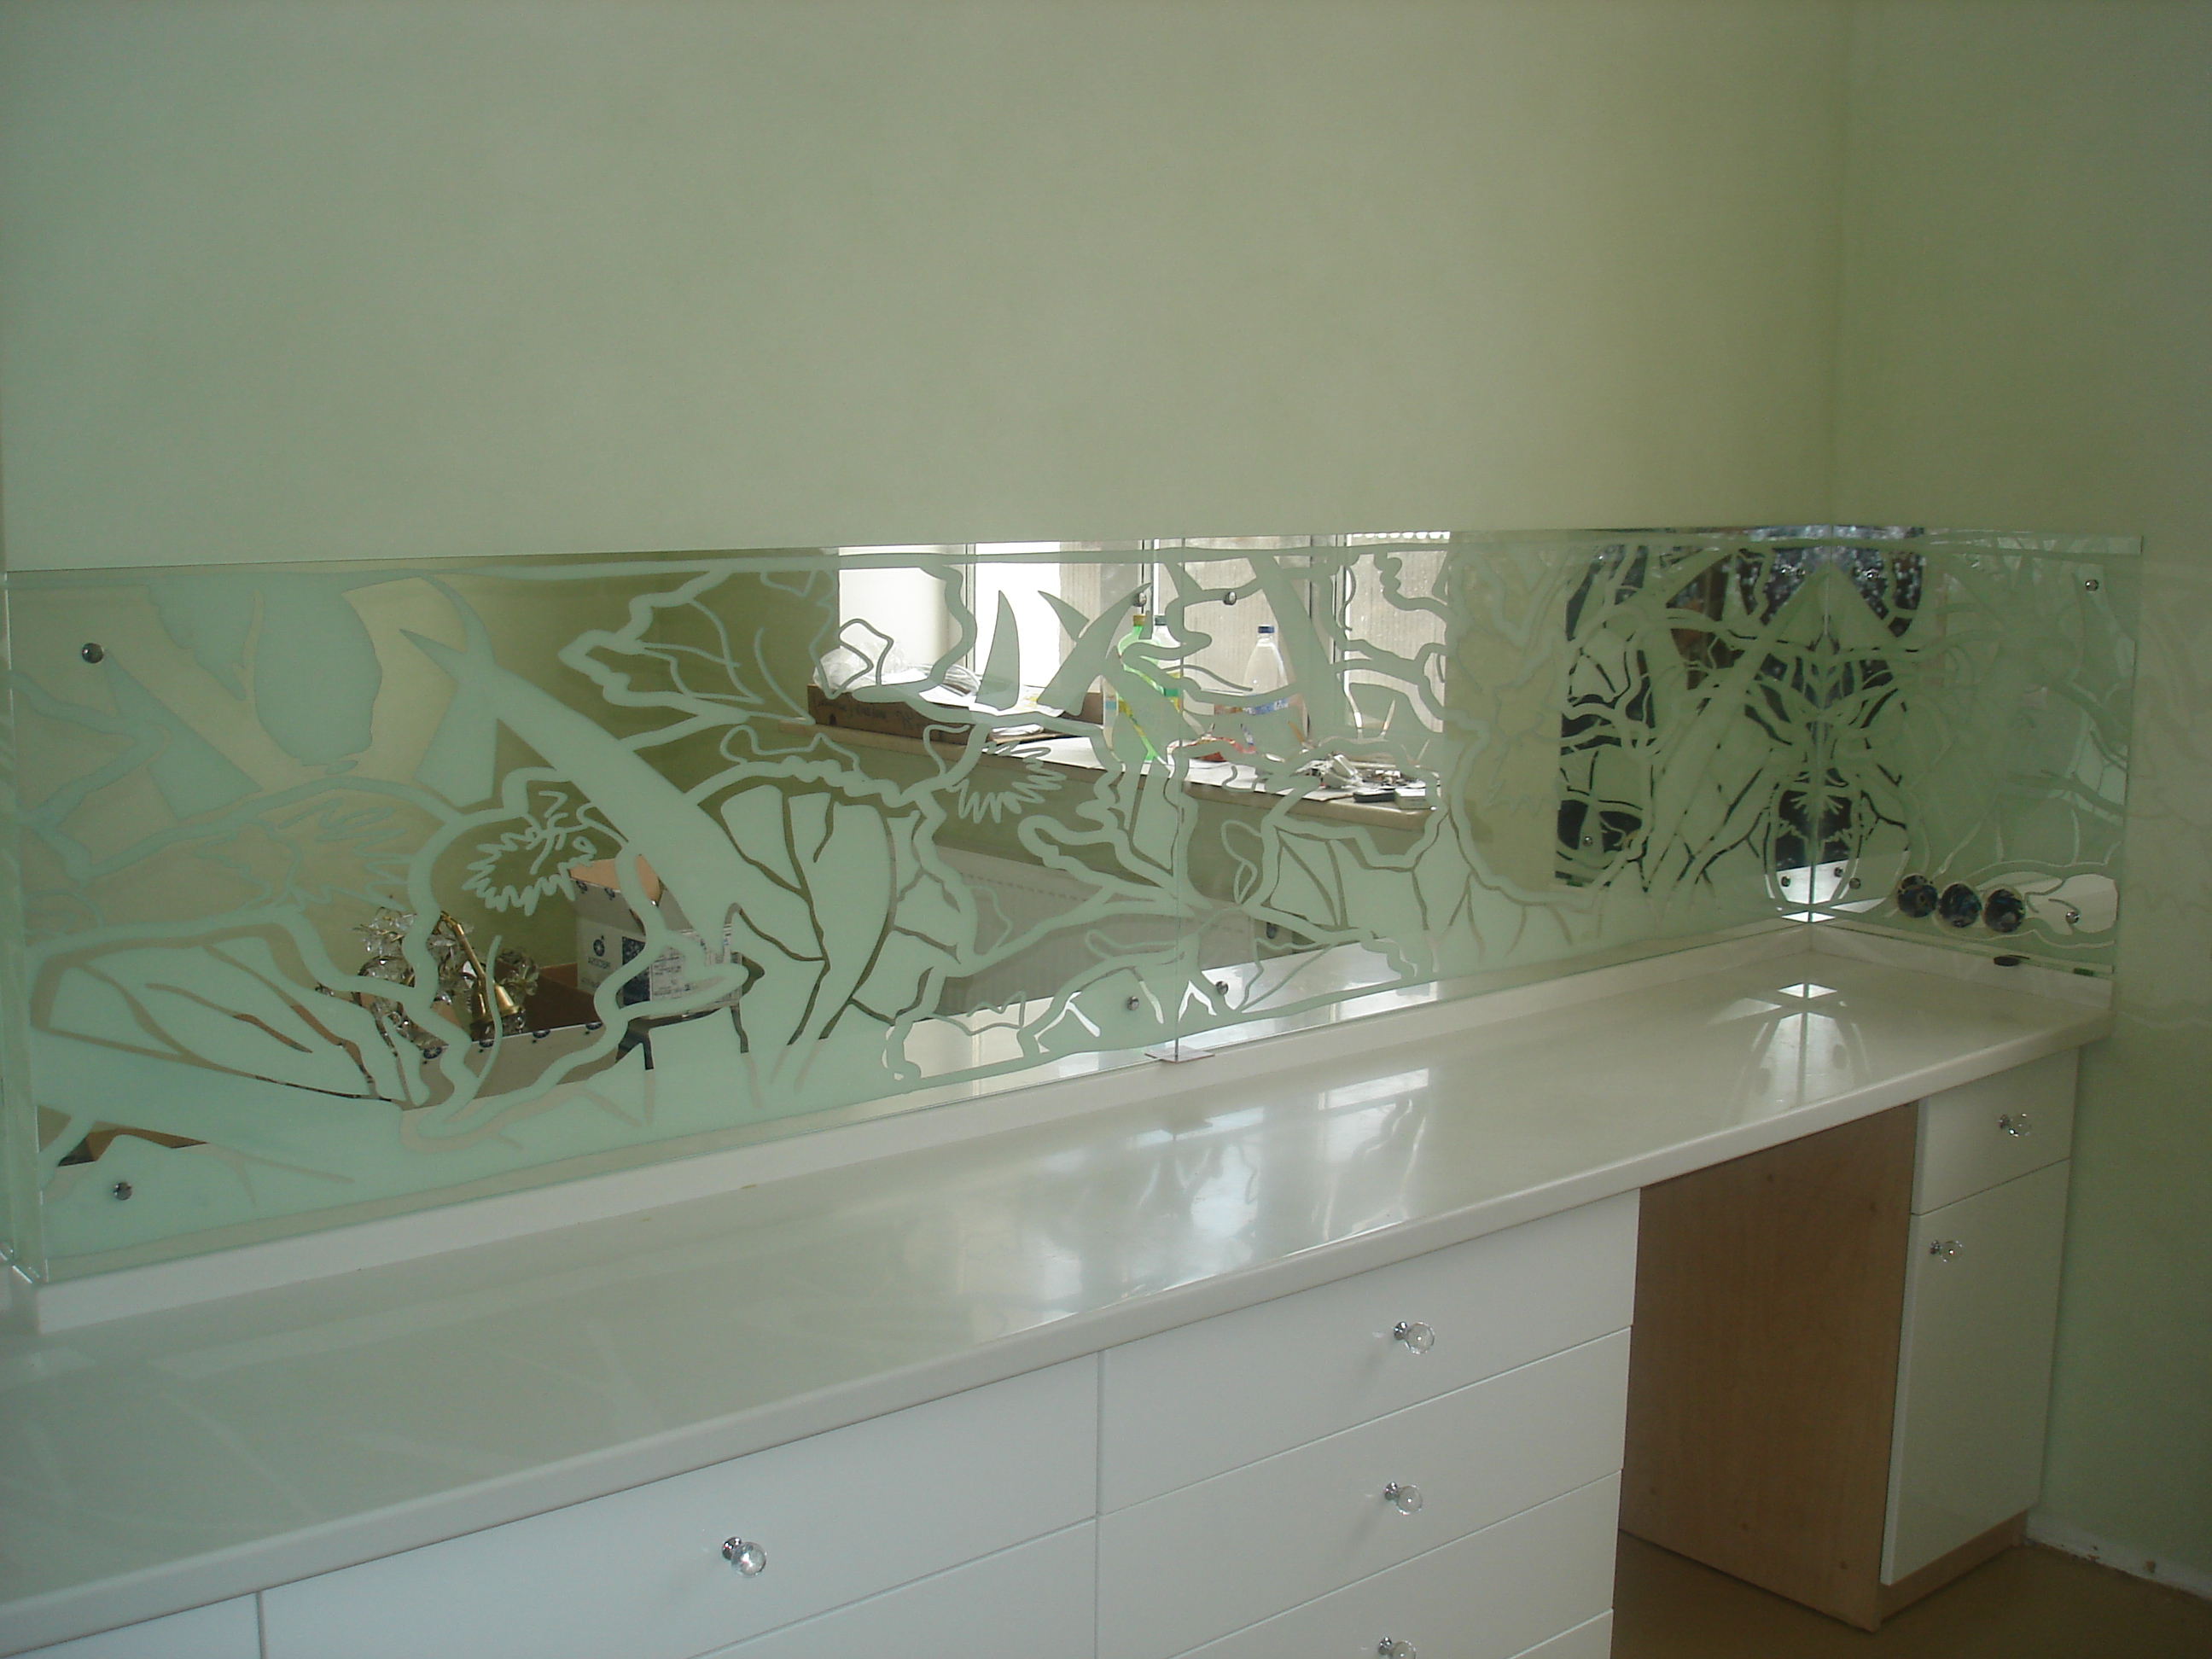 Steklostol – зеркало на заказ в киеве